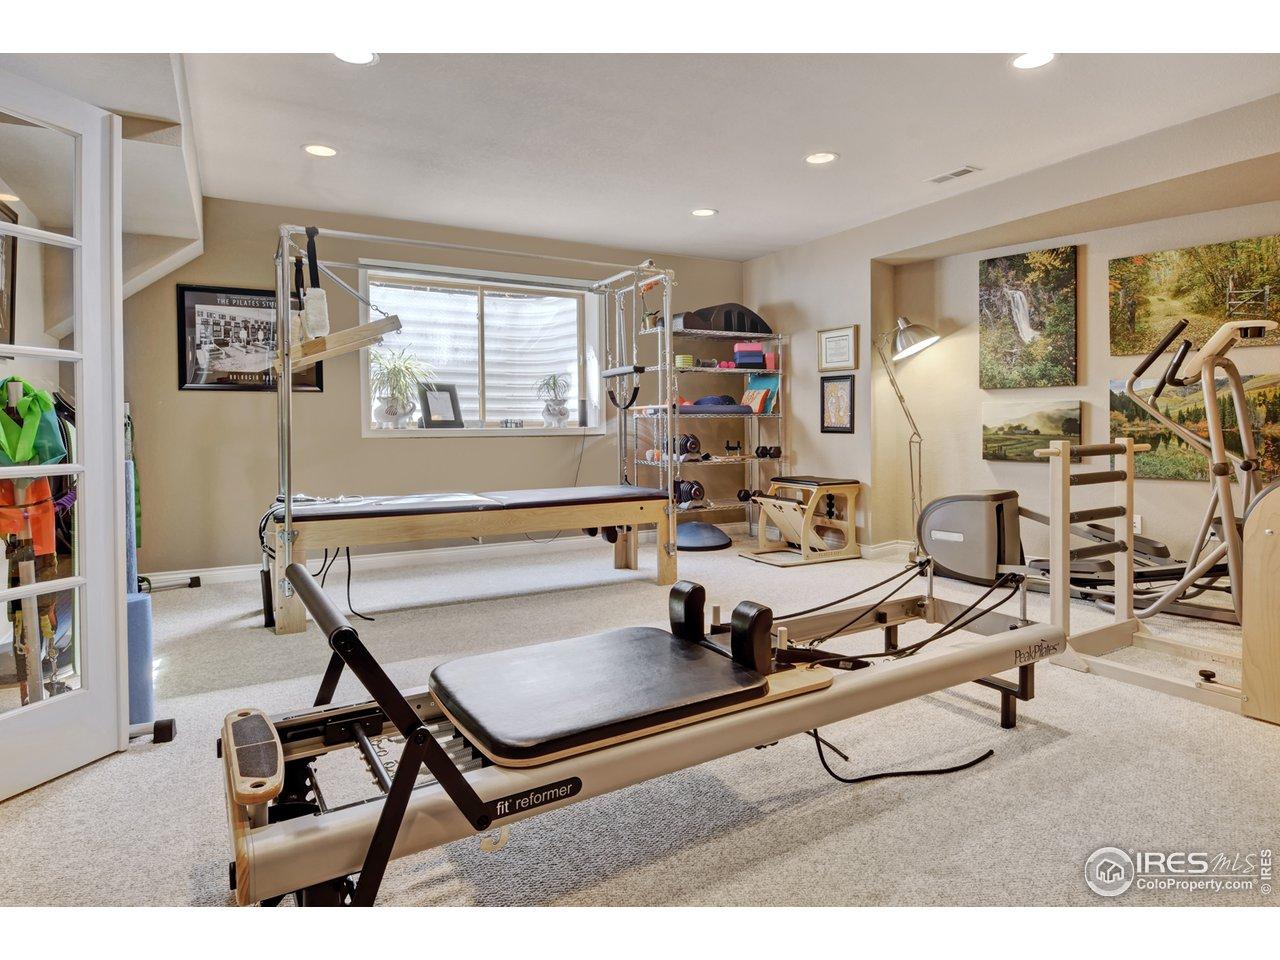 Home Gym, Media Room, Kids' Playroom, you choose